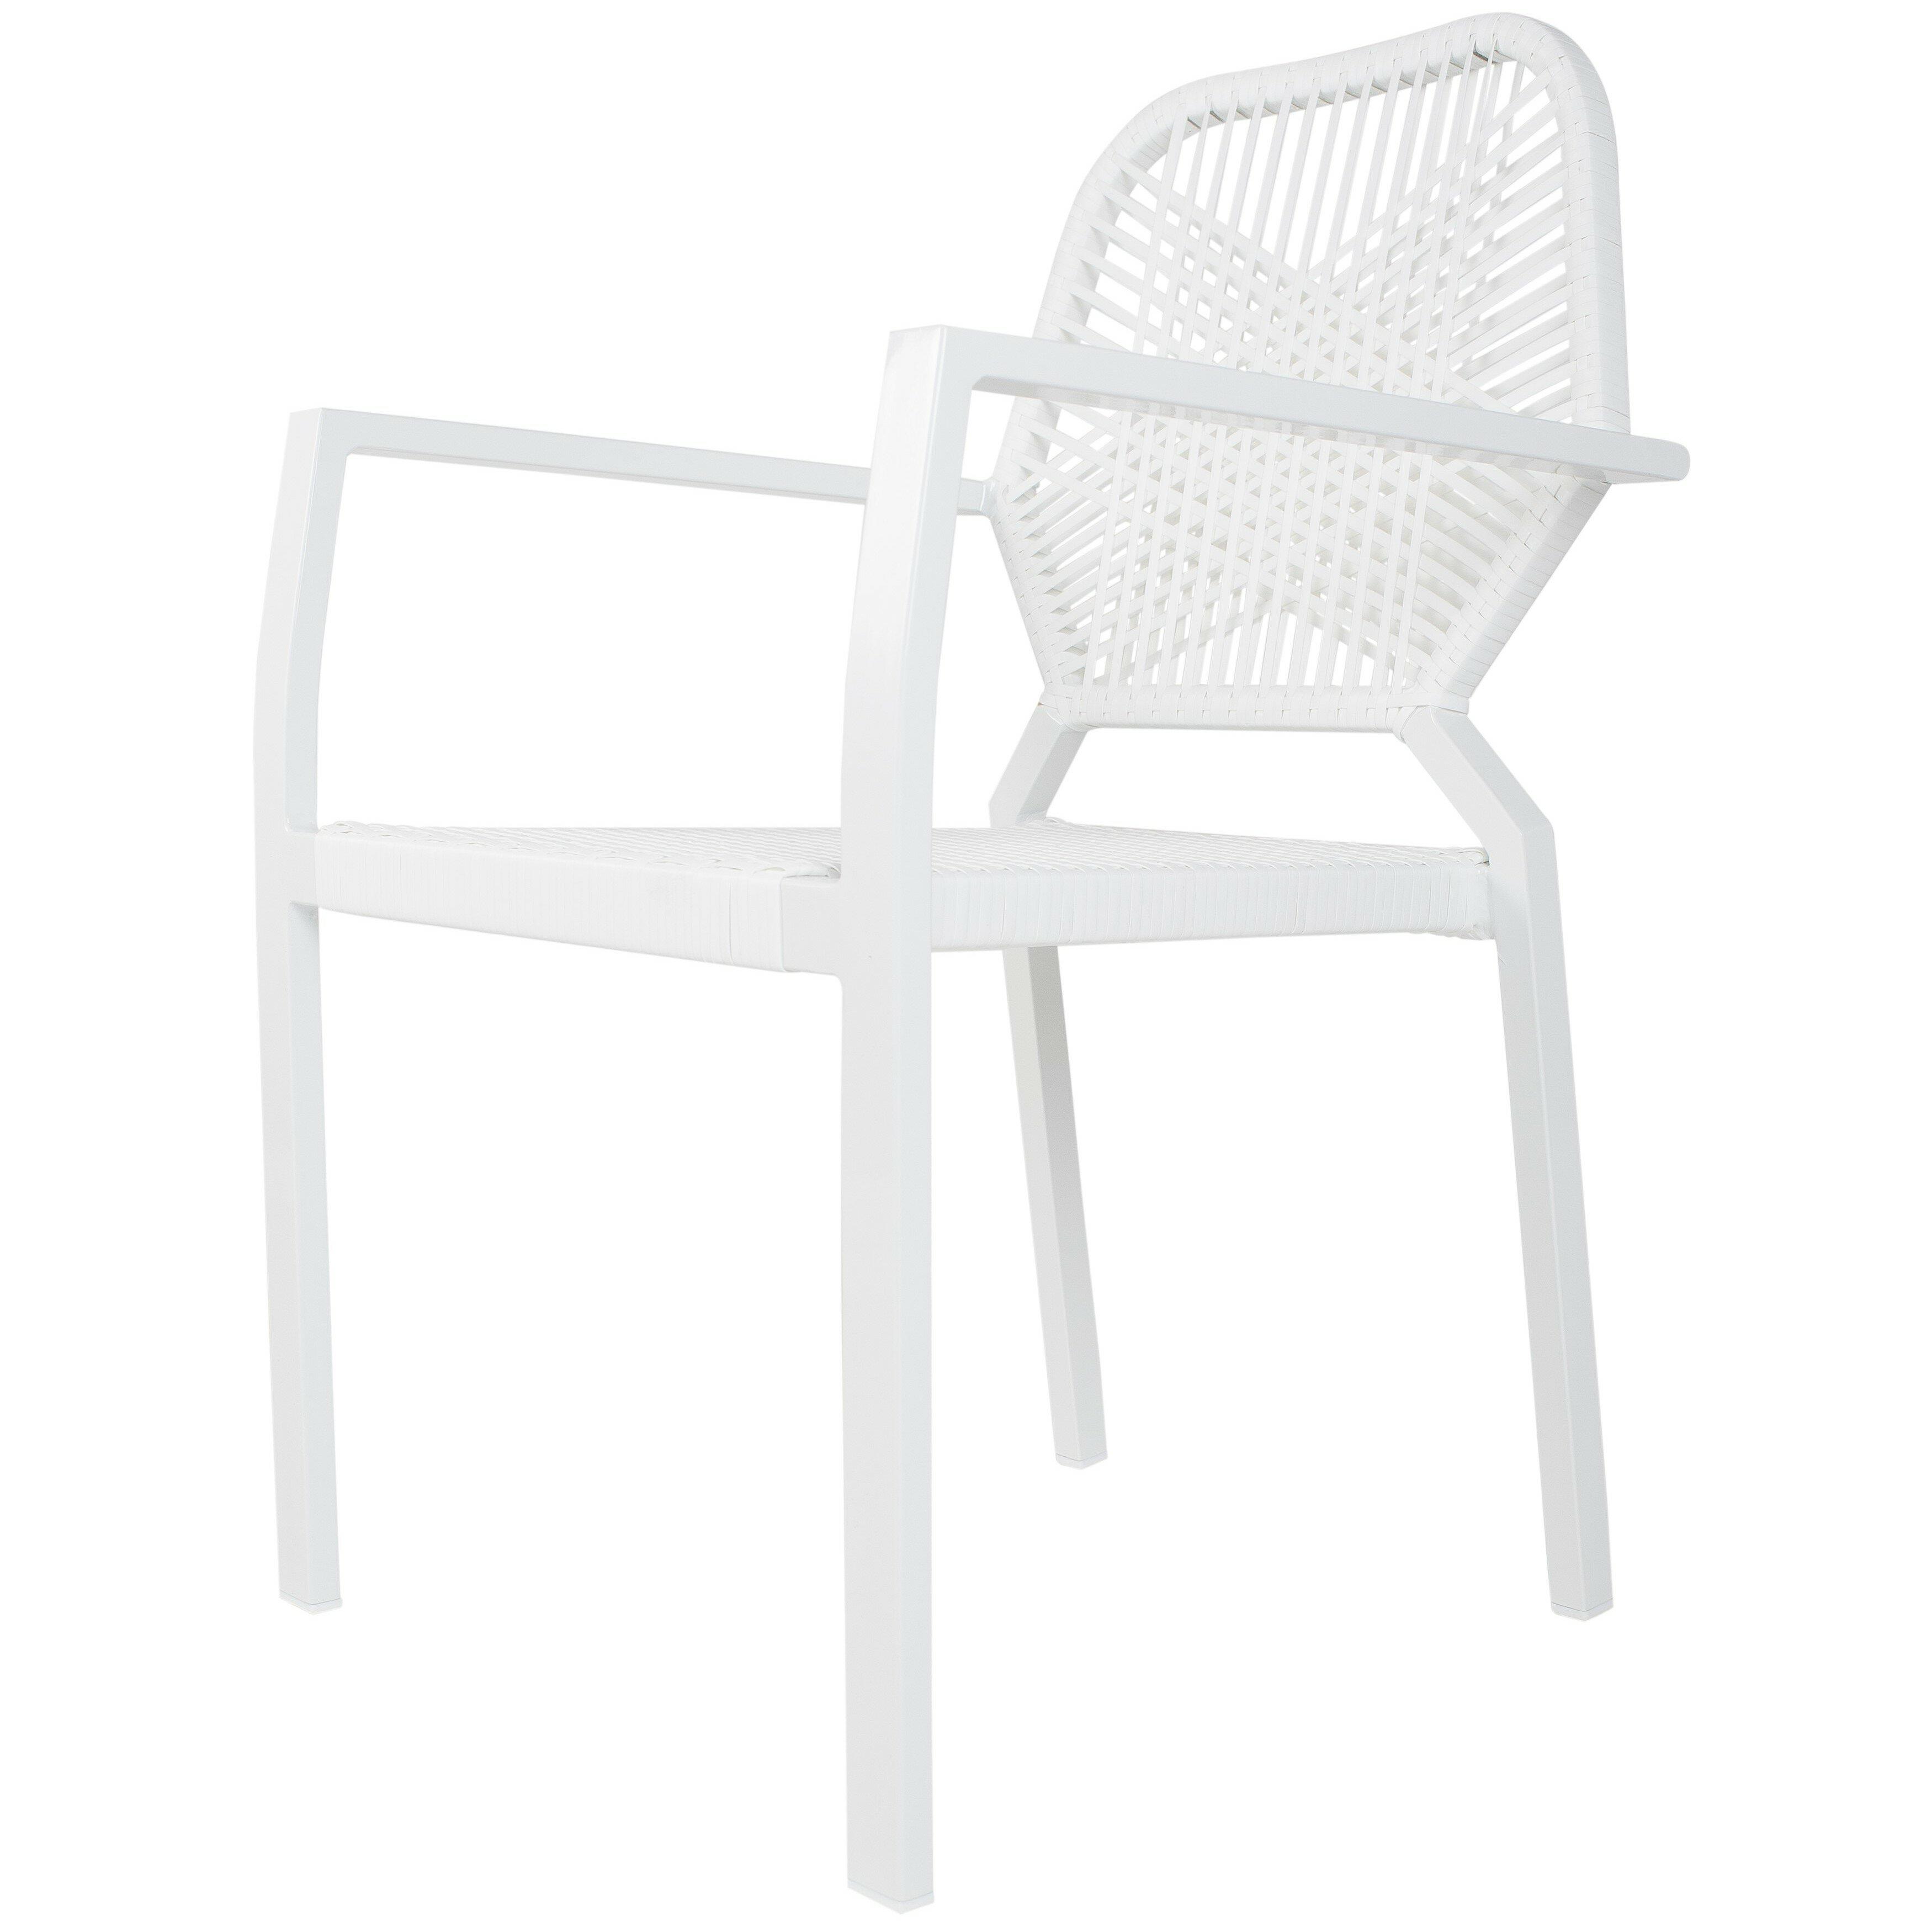 Ebern Designs Hollander Commercial Grade Stacking Patio Dining Chair Reviews Wayfair